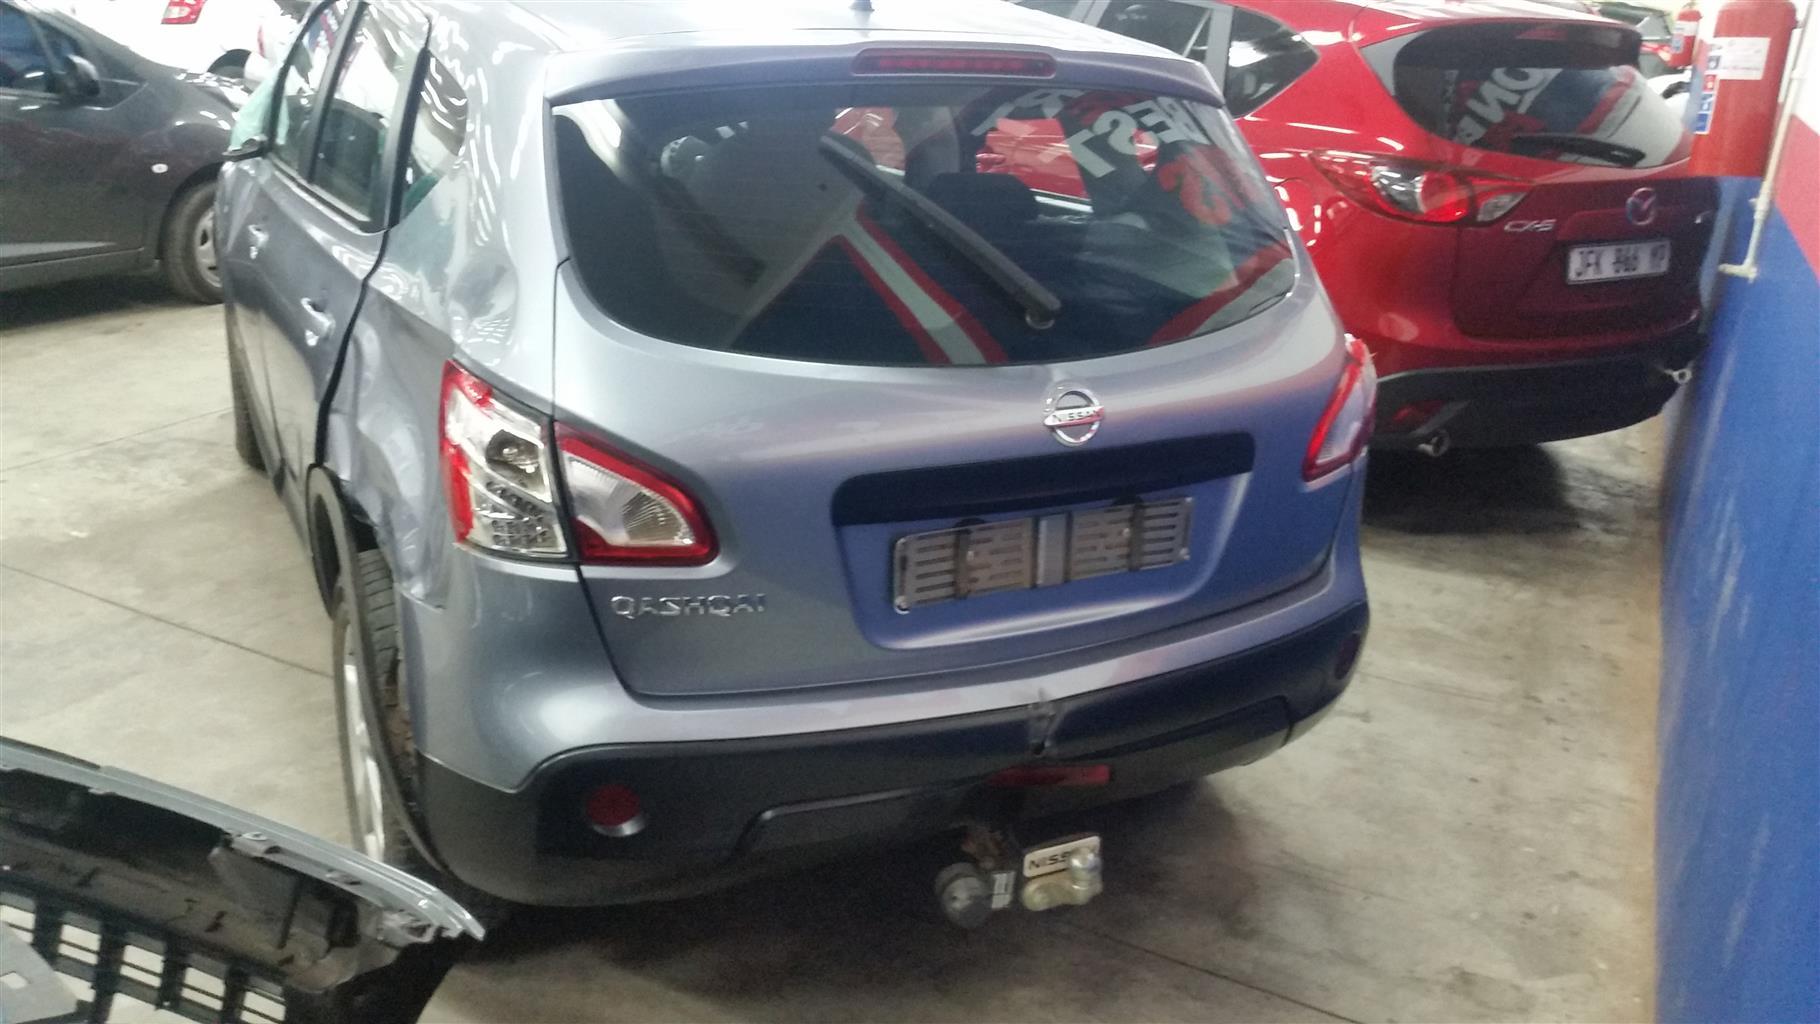 Nissan QashQai 2011 1.6 Accenta (REF R23833)